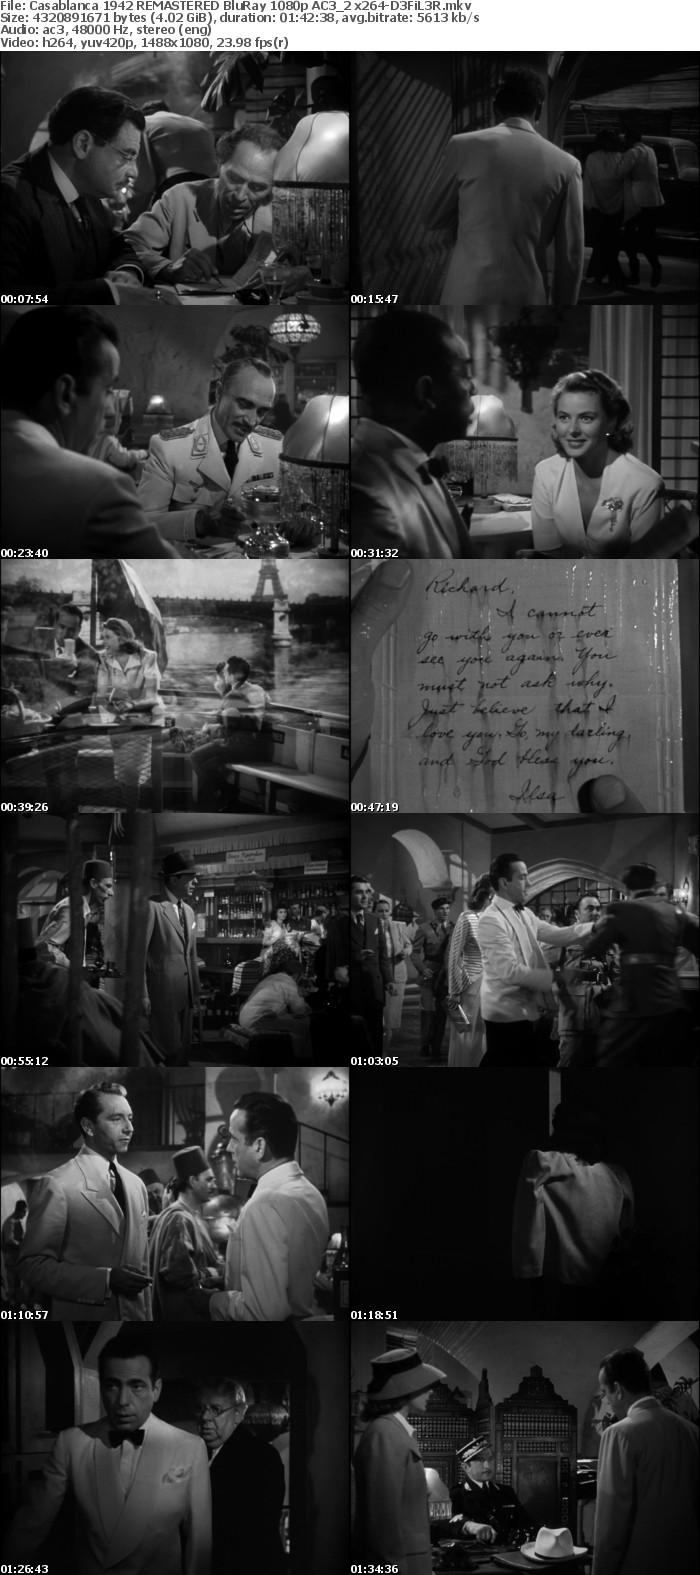 Casablanca 1942 REMASTERED BluRay 1080p AC3 2 x264-D3FiL3R